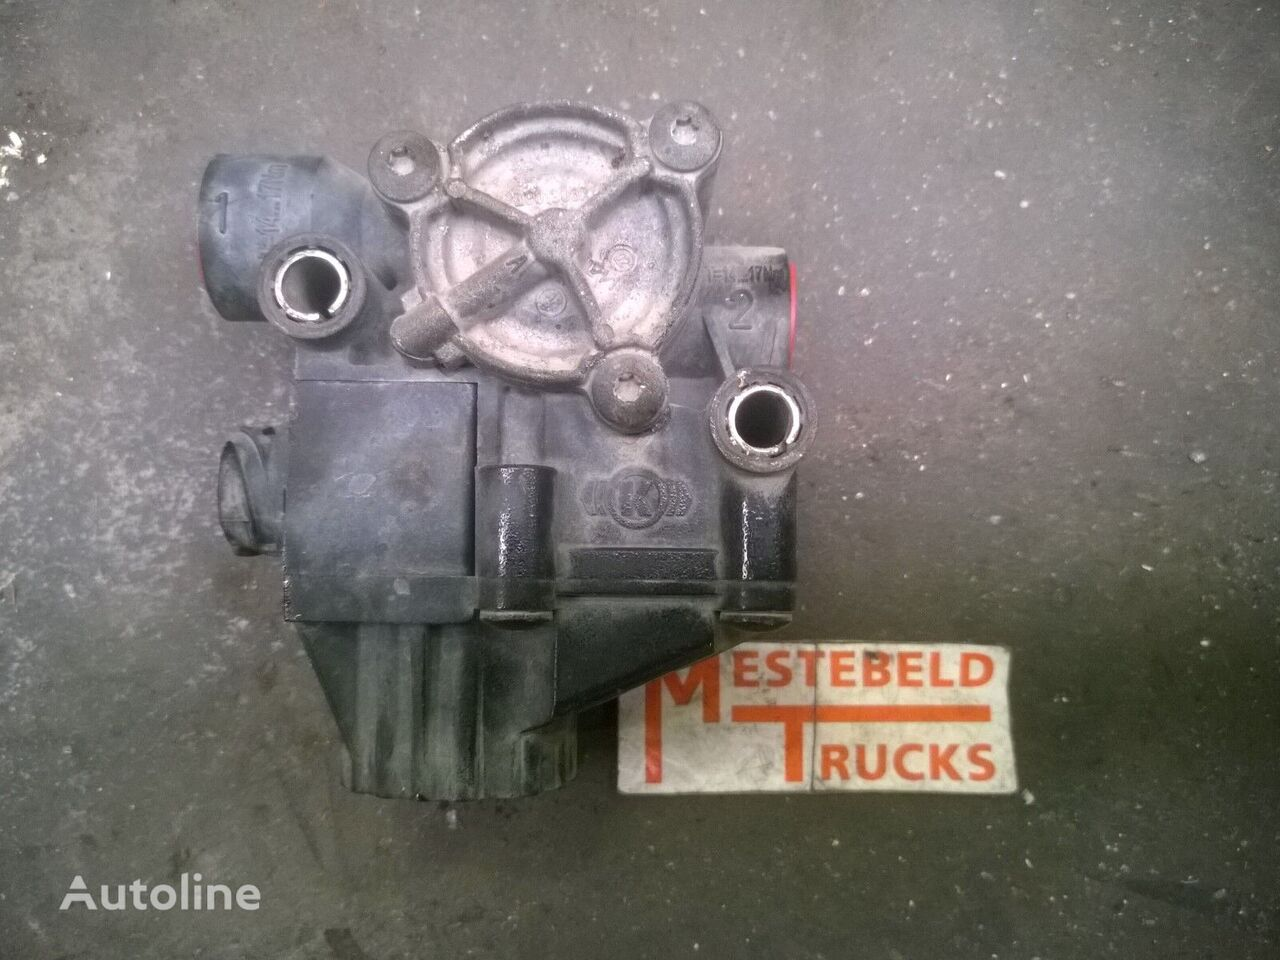 ABS magneetventiel Ventil für MAN ABS magneetventiel L2000 LKW